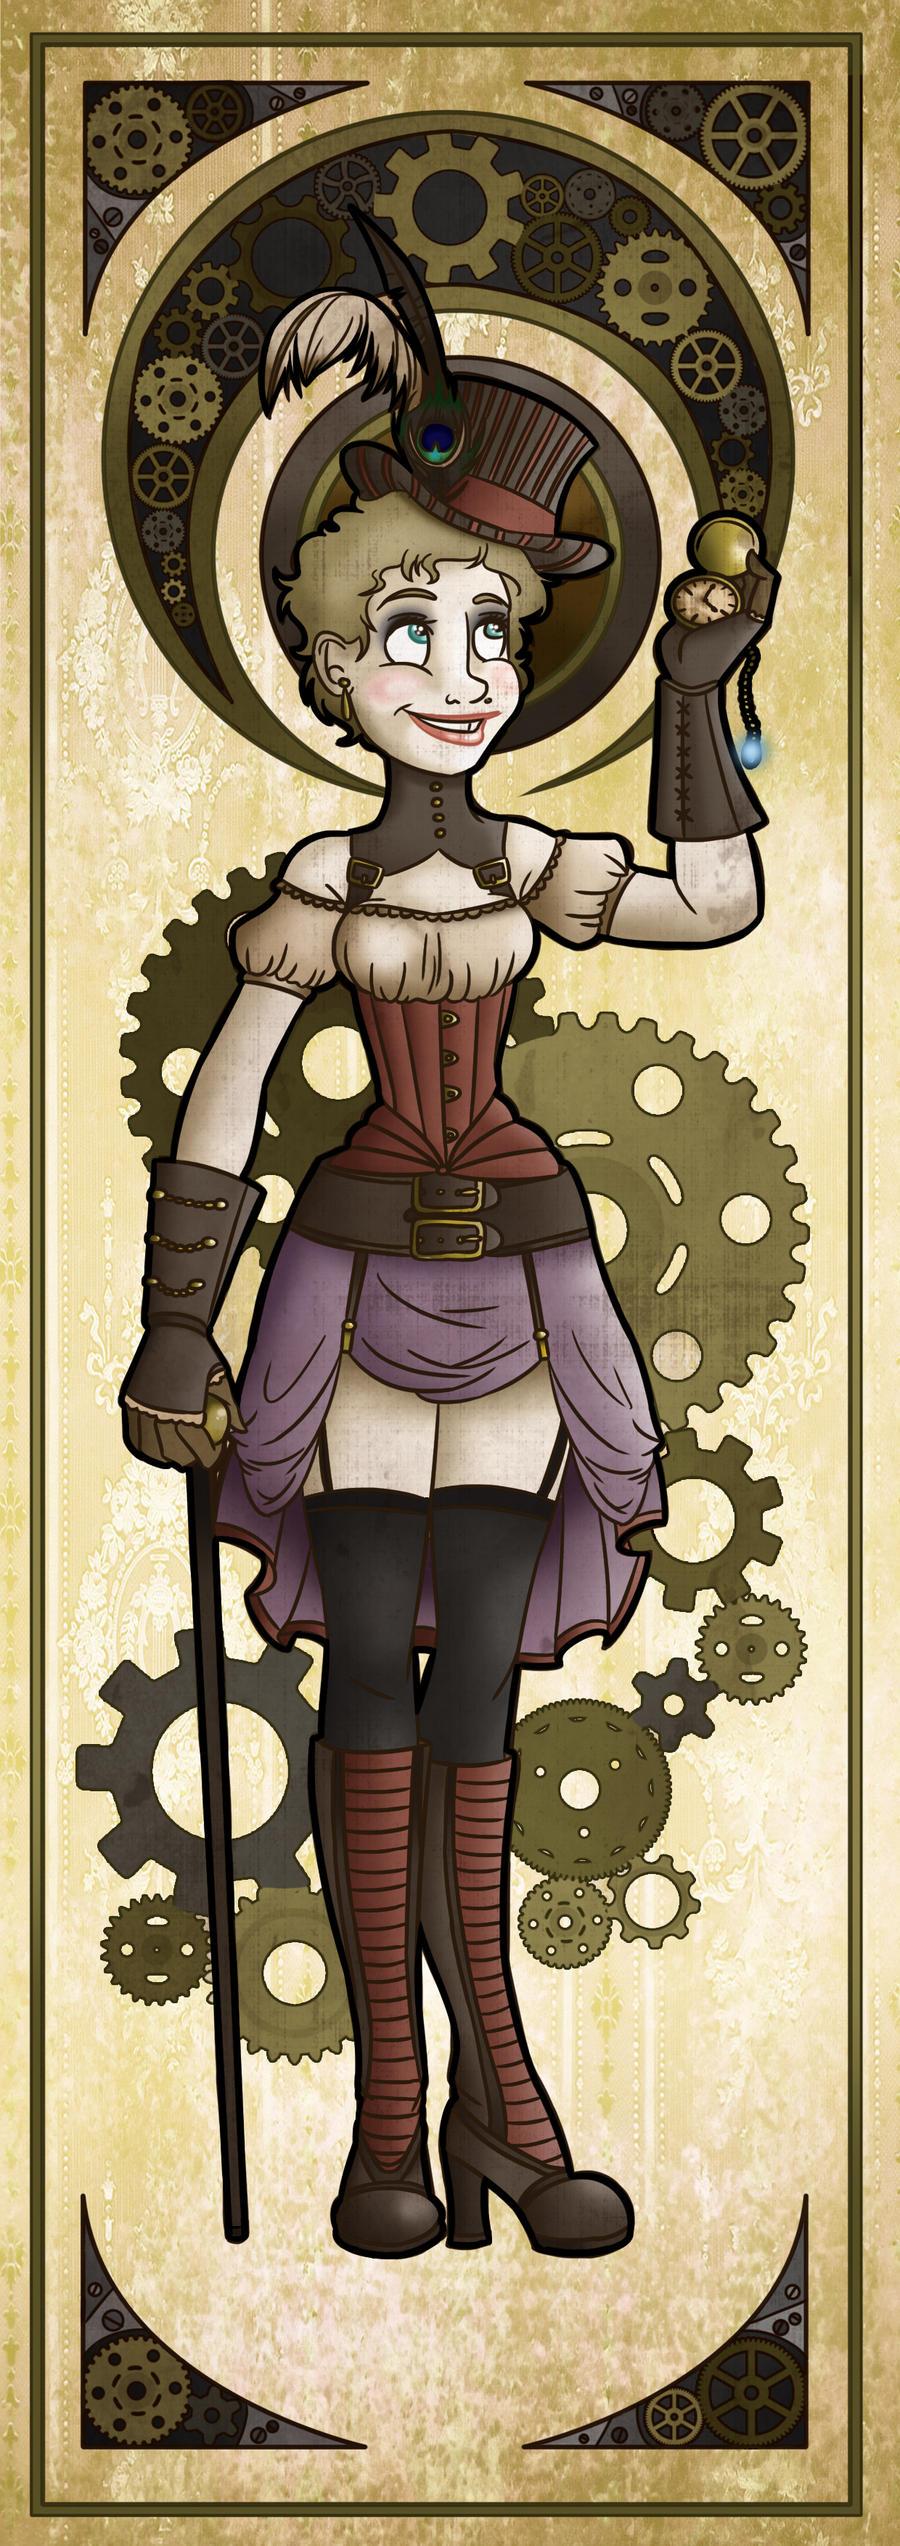 http://fc09.deviantart.net/fs70/i/2012/221/9/9/steampunk_sorephene_by_pinkbassist3-d5aj98b.jpg